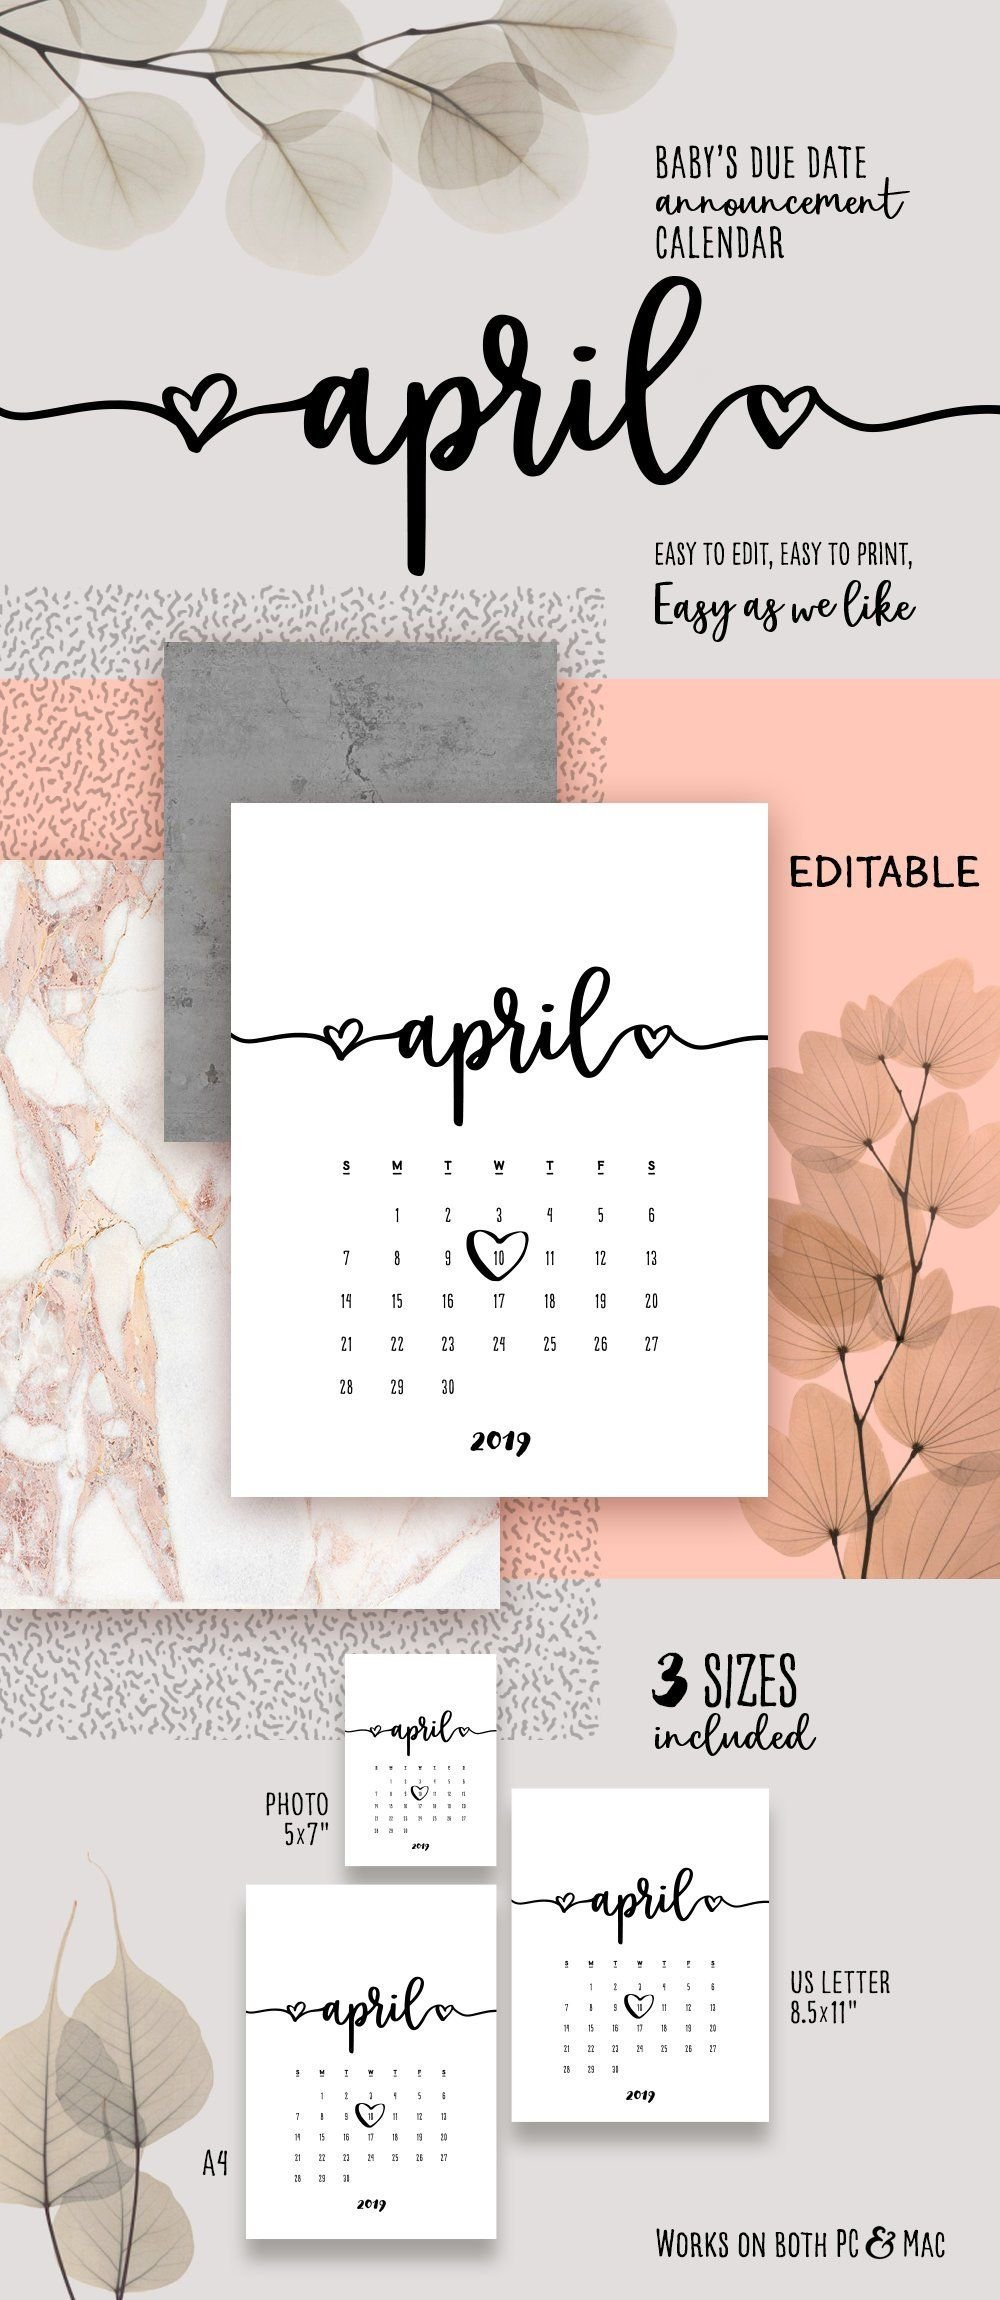 Pin On Pregnancy Announcement Calendar Free Printable Baby Due Date Calendar